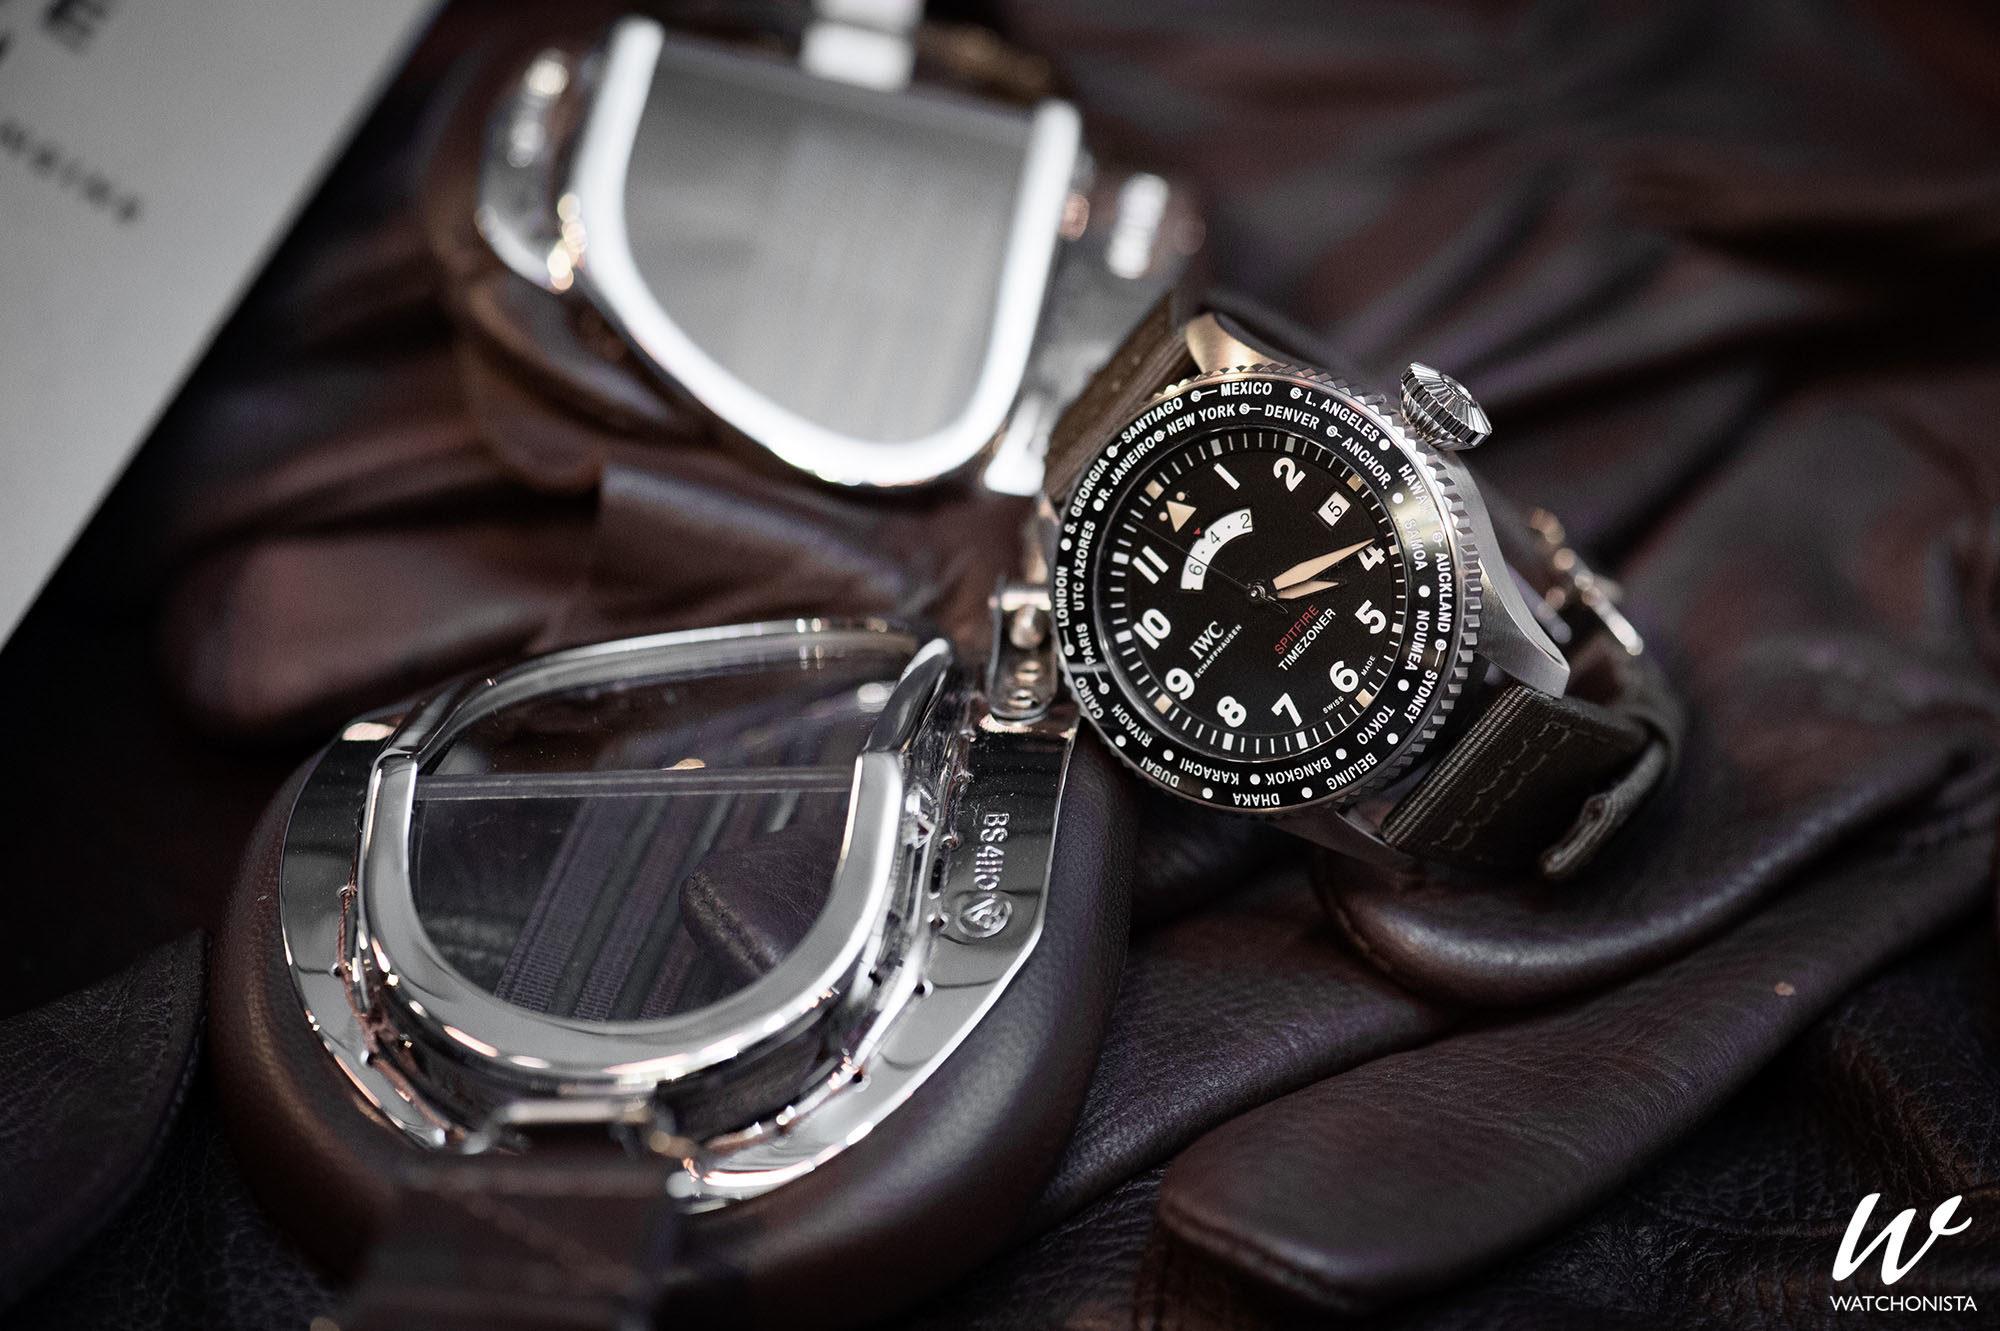 224207b67f8 IWC Pilot s Watch Timezoner Spitfire Edition